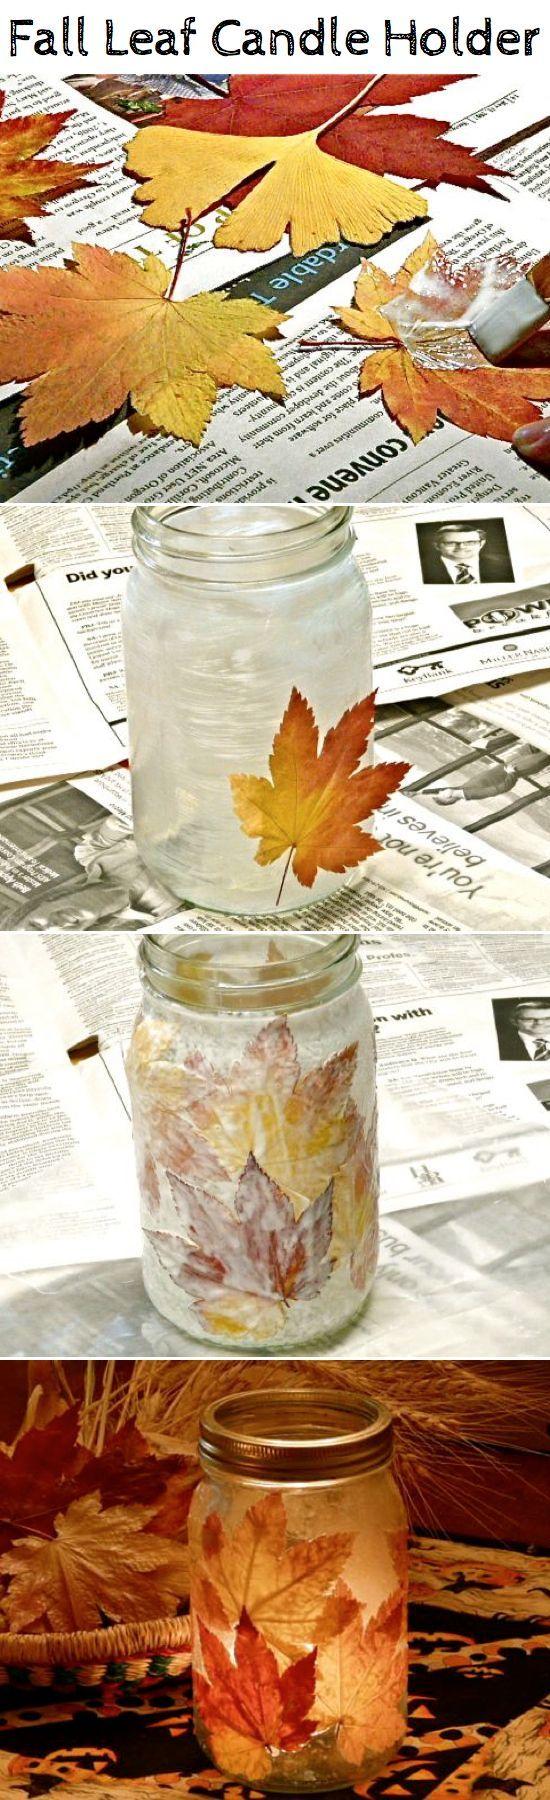 DIY Fall Leaf Candle Holder. Since I have discovered the wonderful world of mod podge!